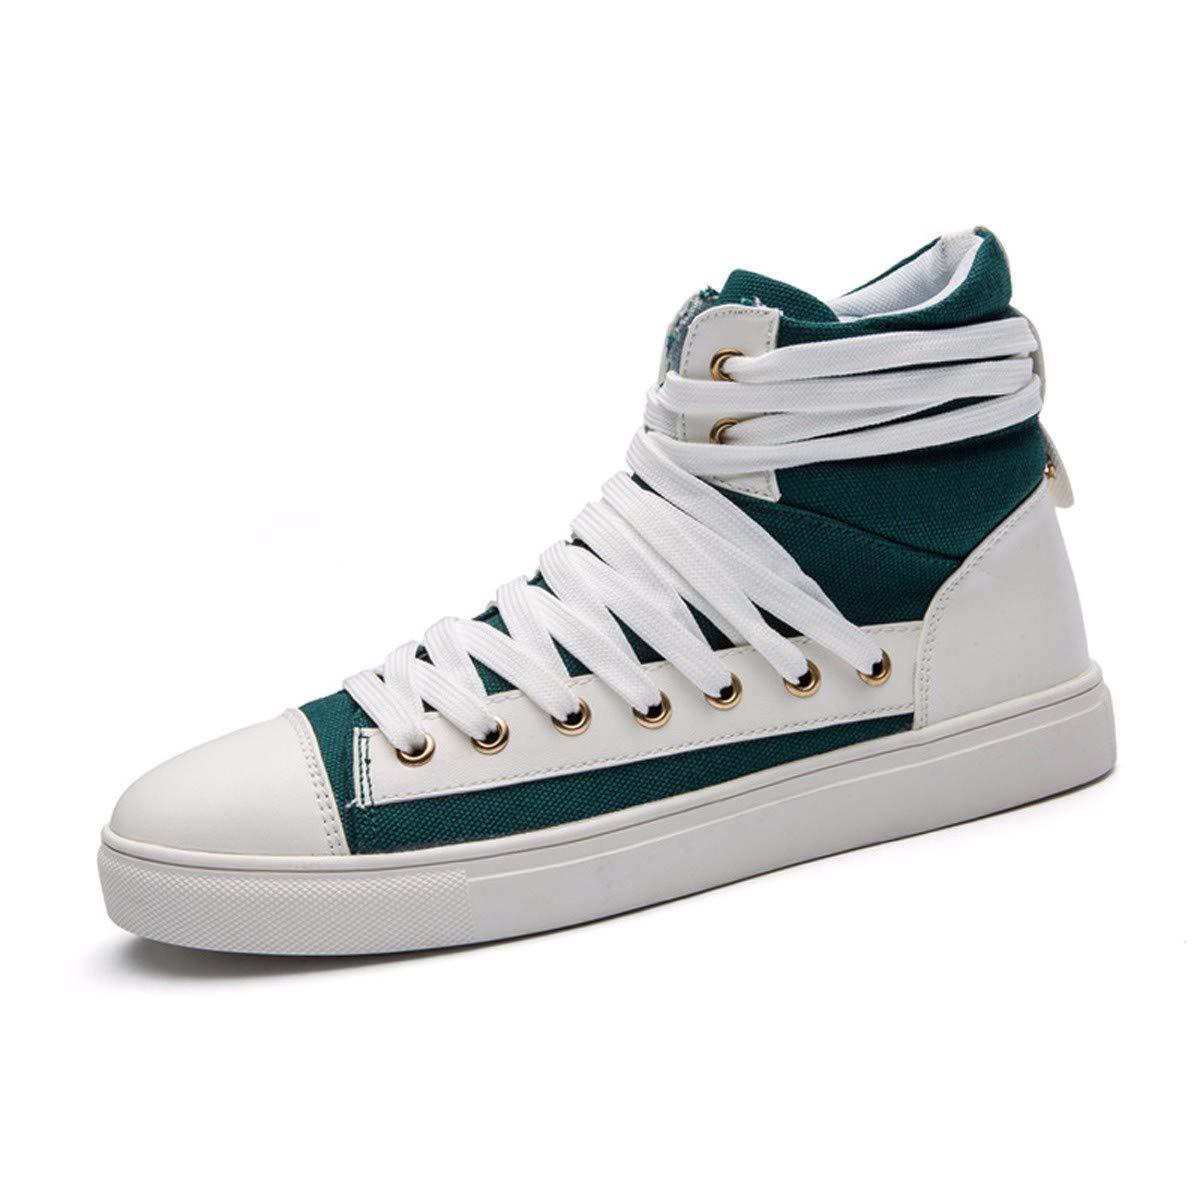 KMJBS-Männer - Schuhe Hohe Leinwand Schuhe Die Junge  Herrenchen